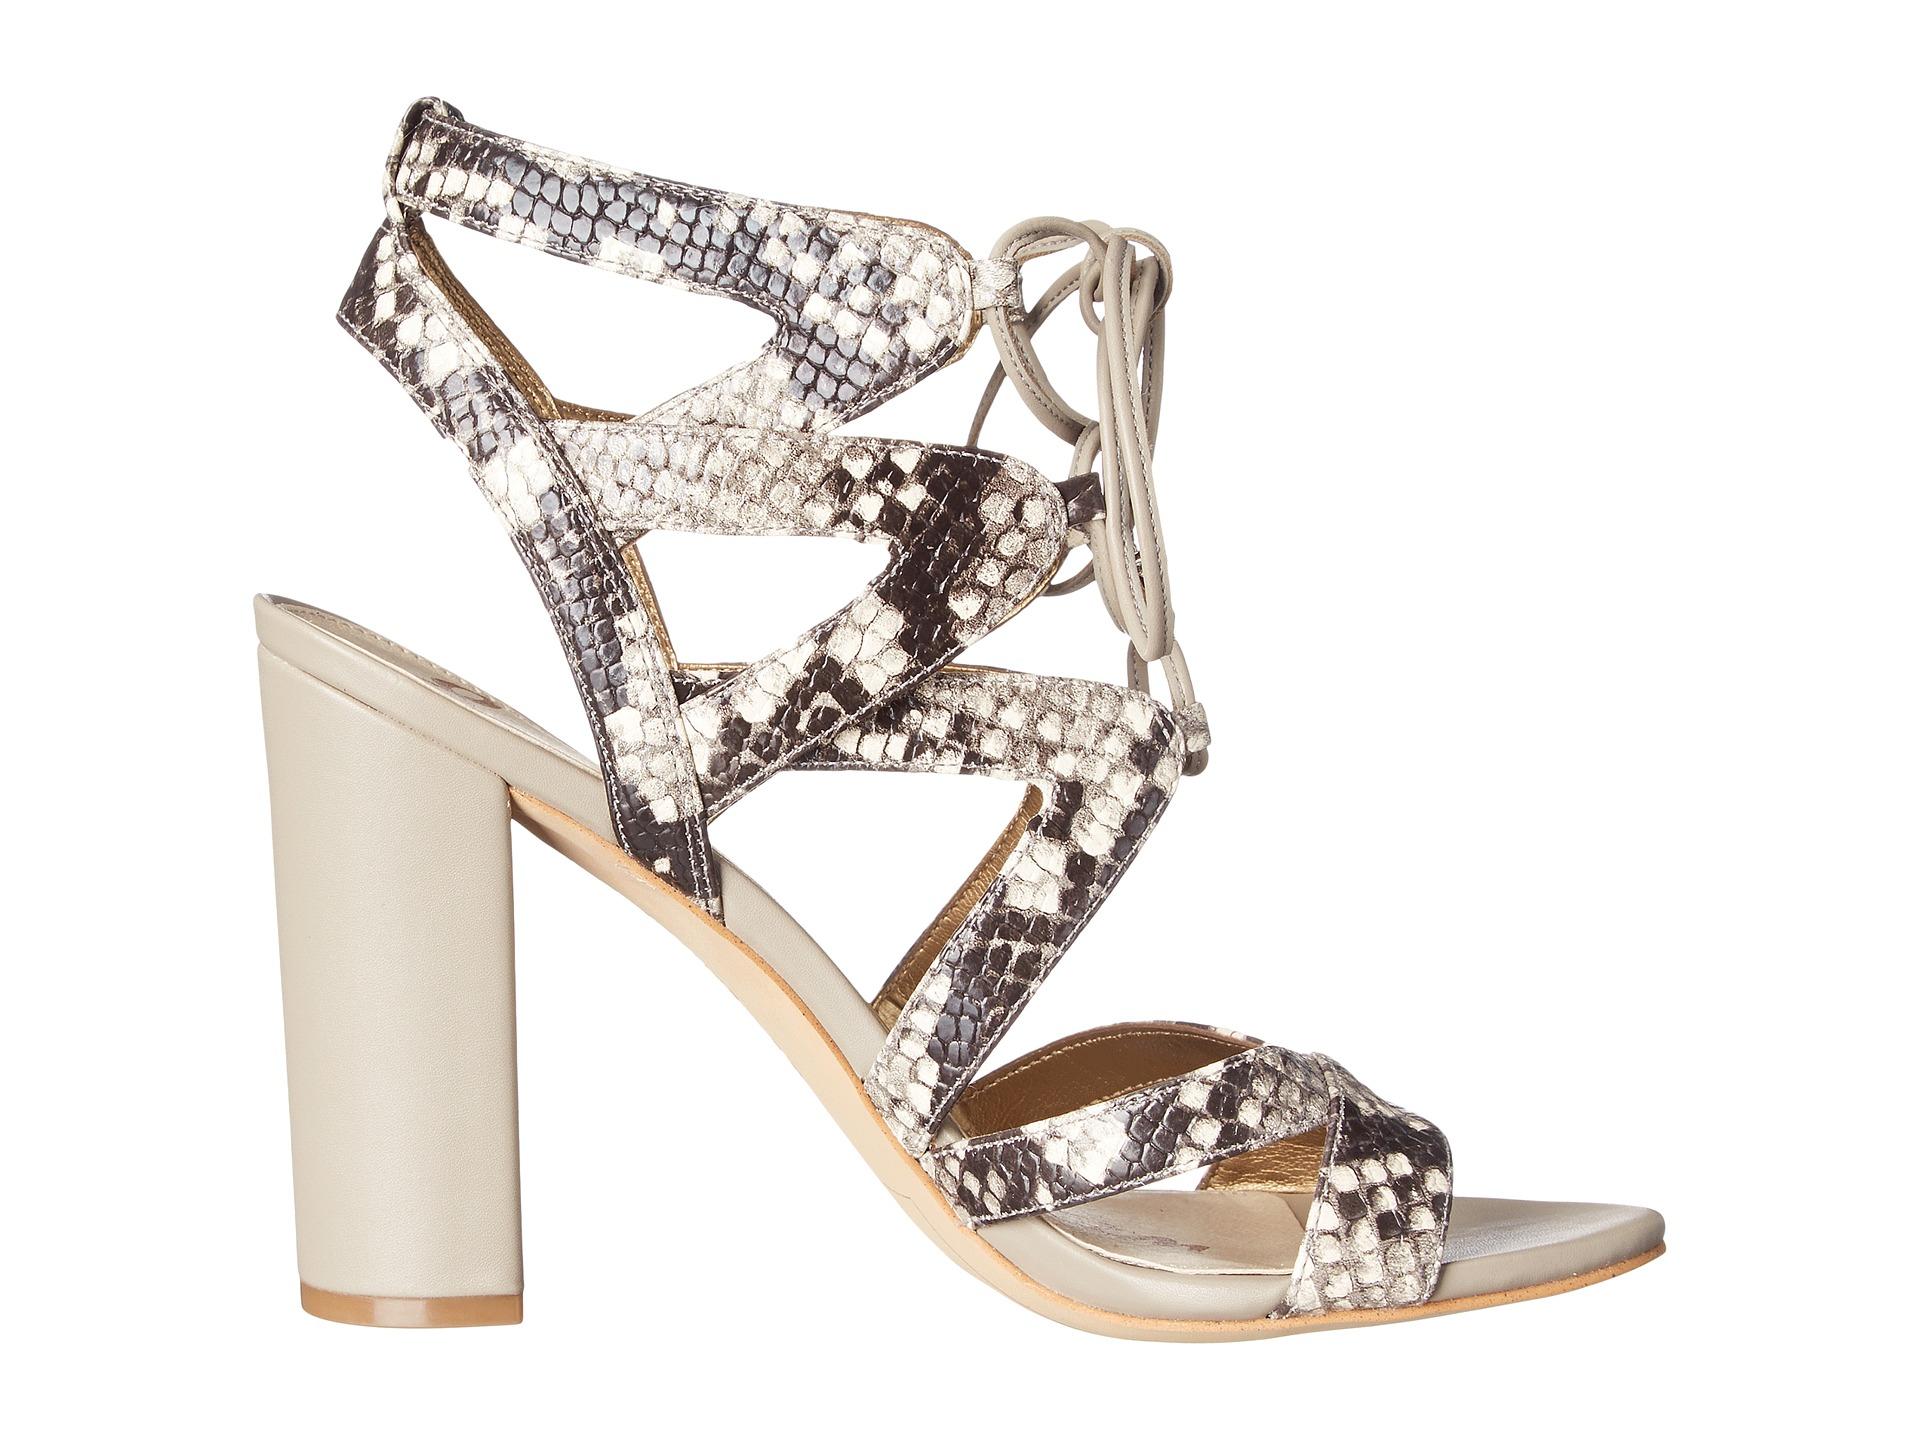 ae7b355f69adc Lyst - Sam Edelman Yardley Snake-Embossed Leather Sandals